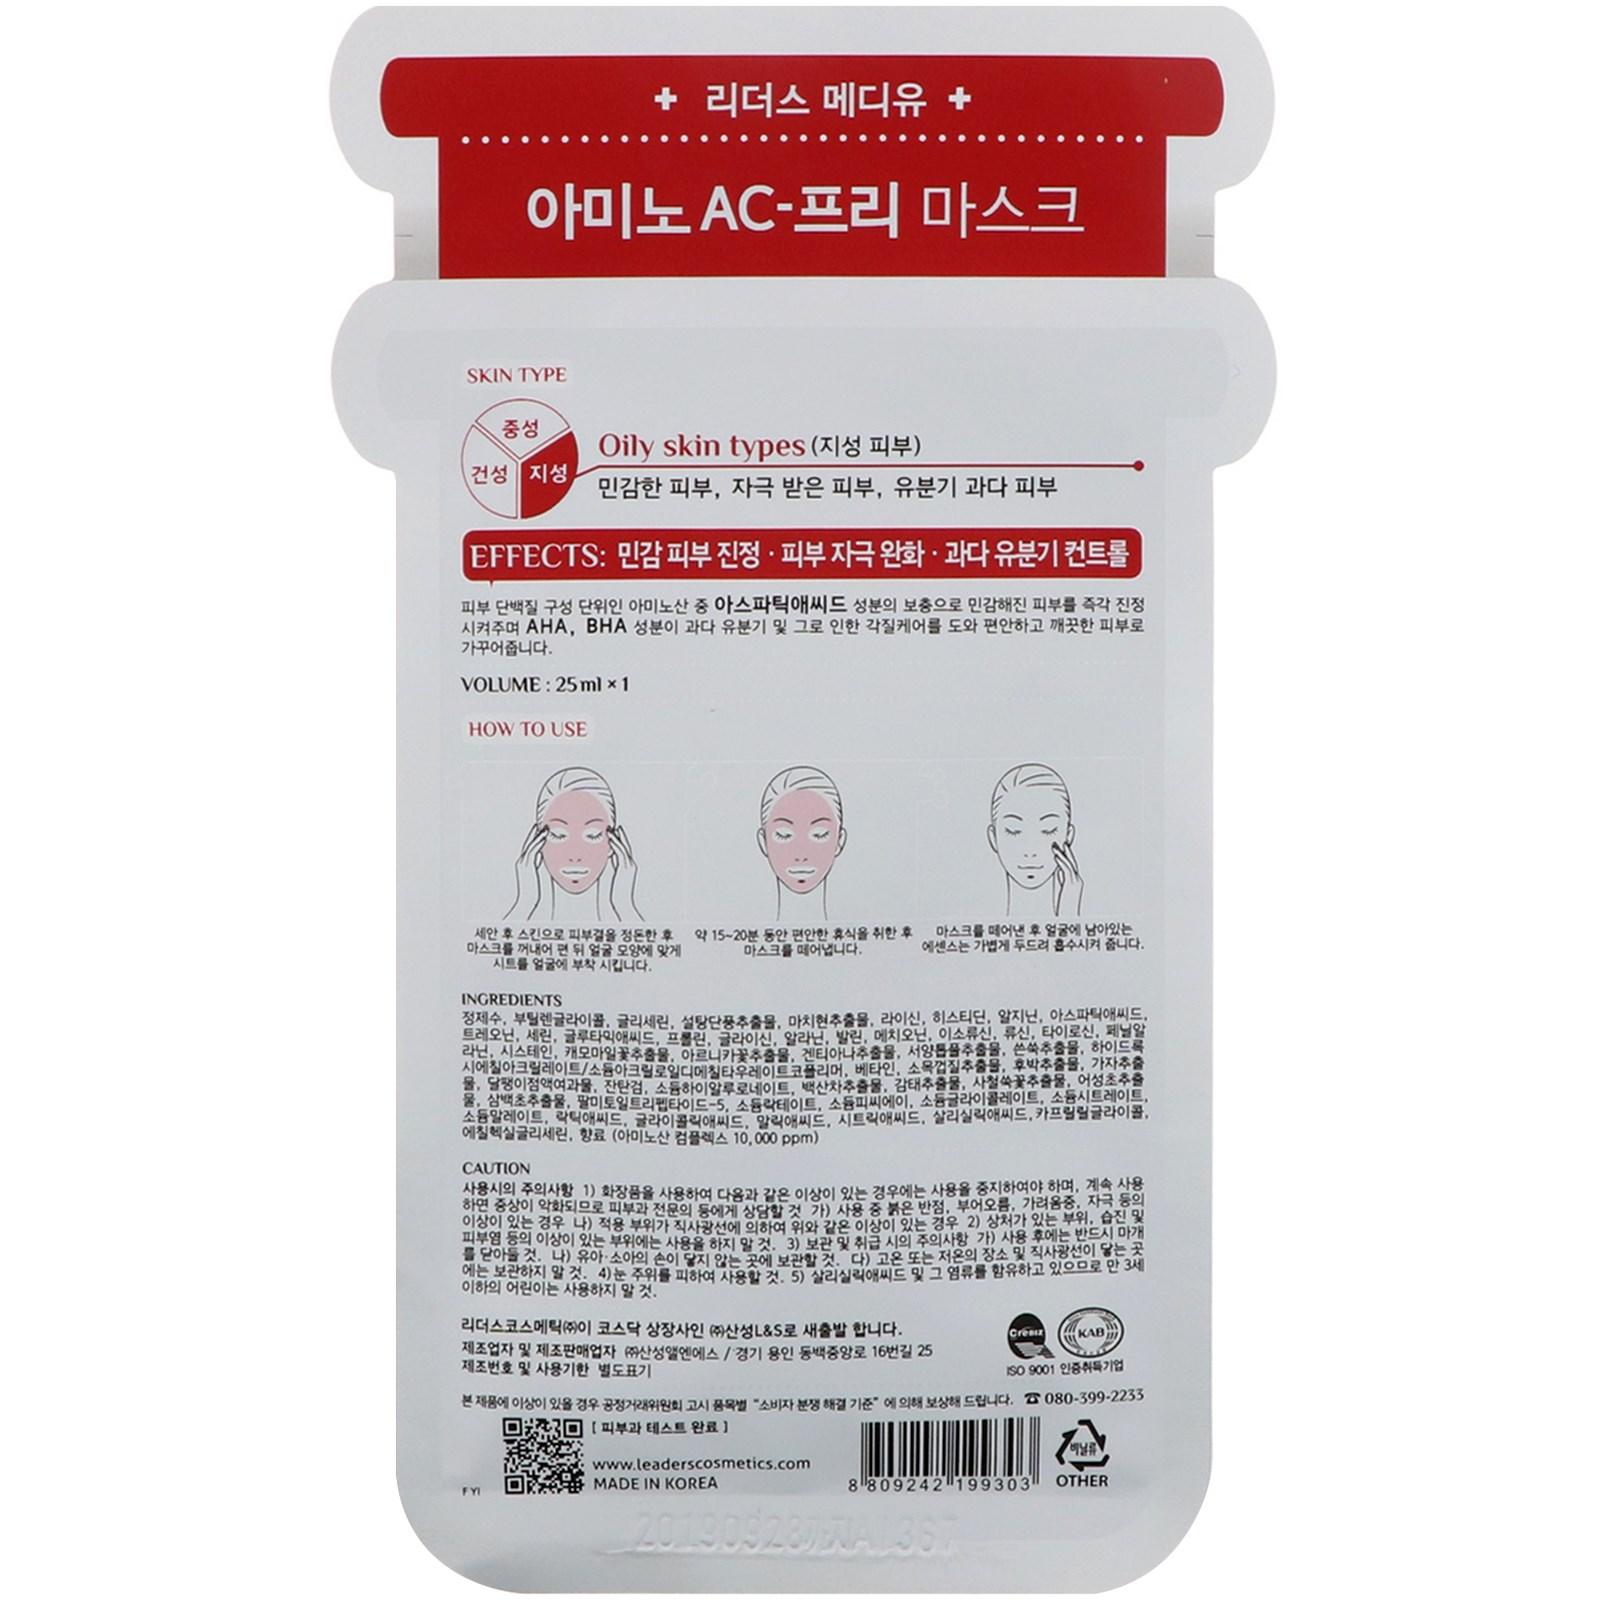 Leaders, Mediu, Amino AC-Free Mask, 1 Mask, 25 ml(pack of 12) Reviva Labs 5% Glycolic Acid Cream, 1.5 Ounces